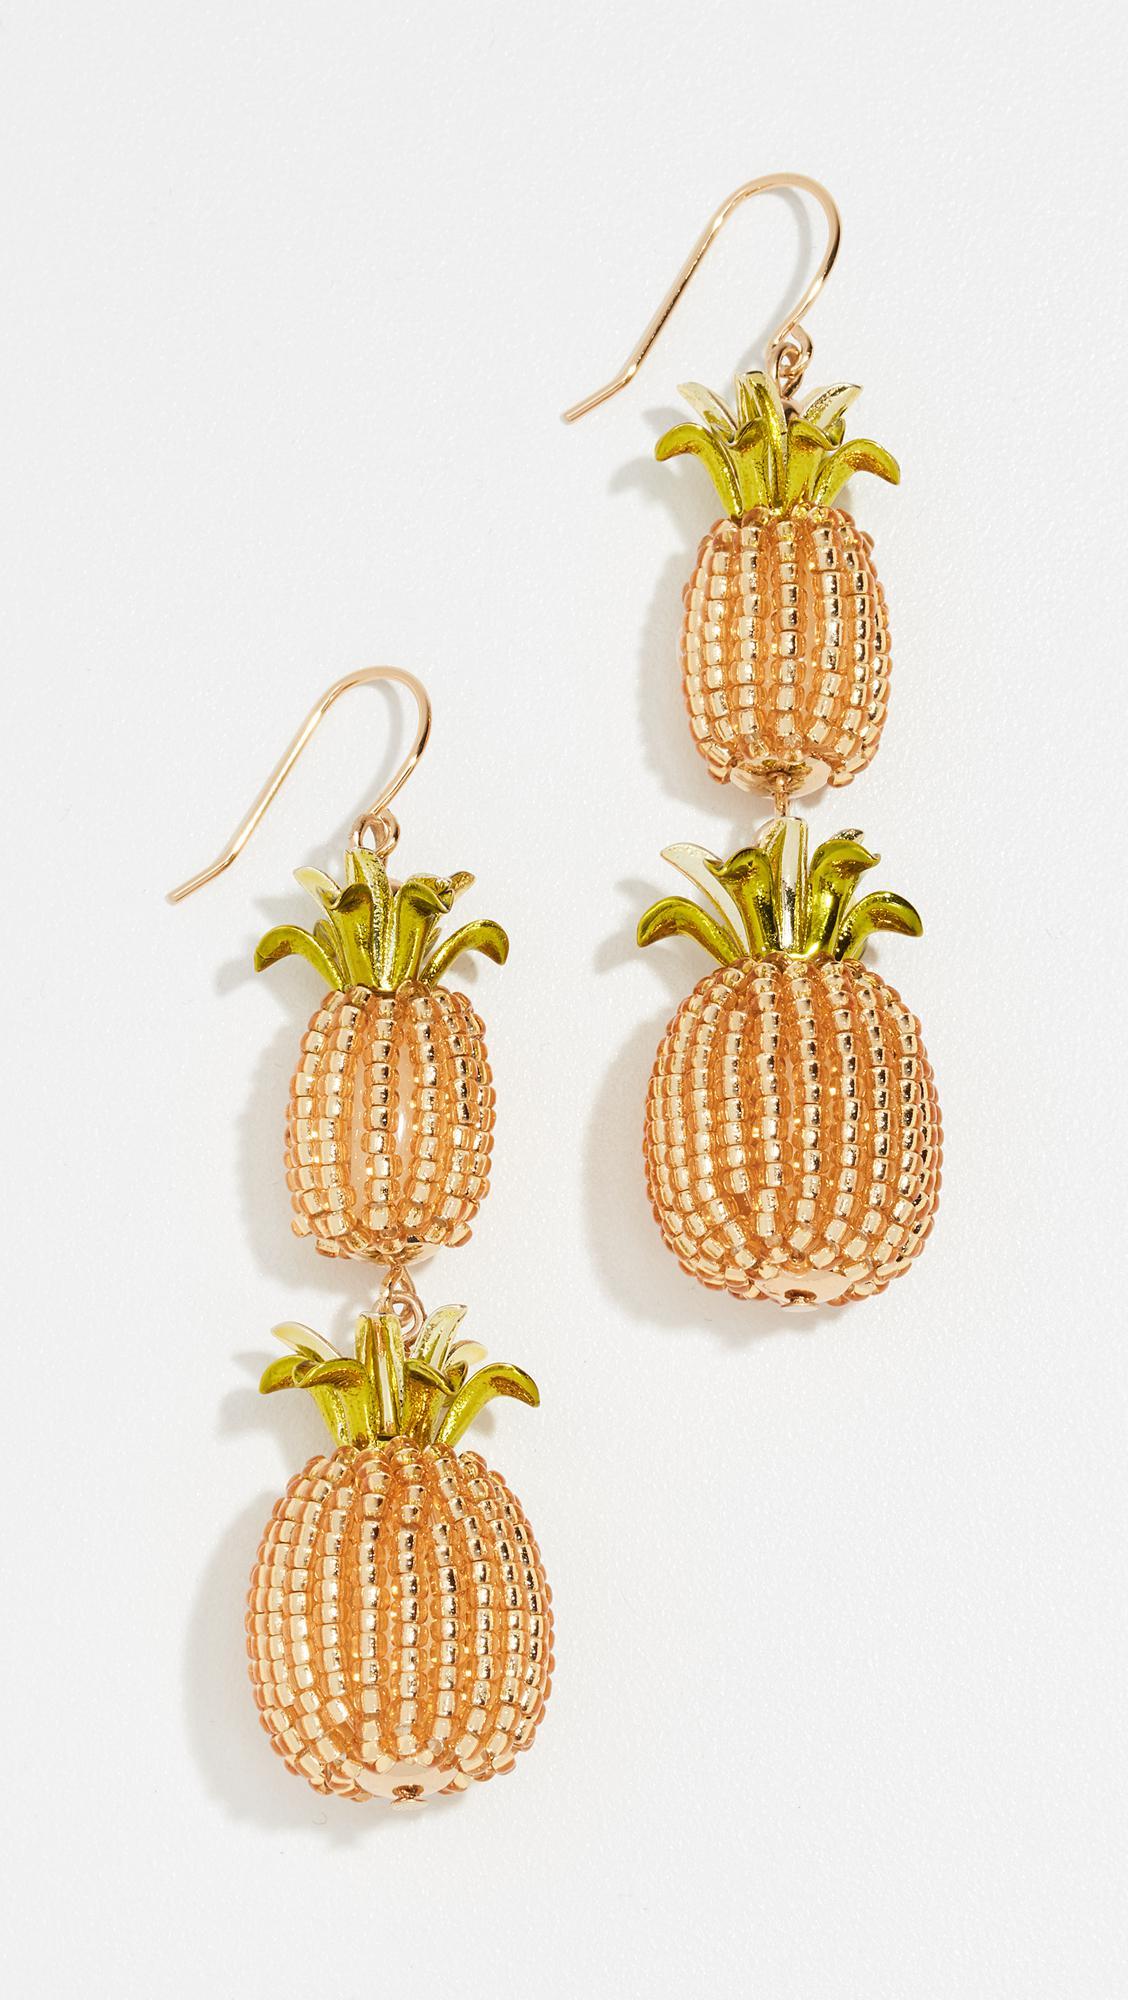 Kate Spade New York By The Pool Pineapple Double Drop Earrings 5WSbS6E4B